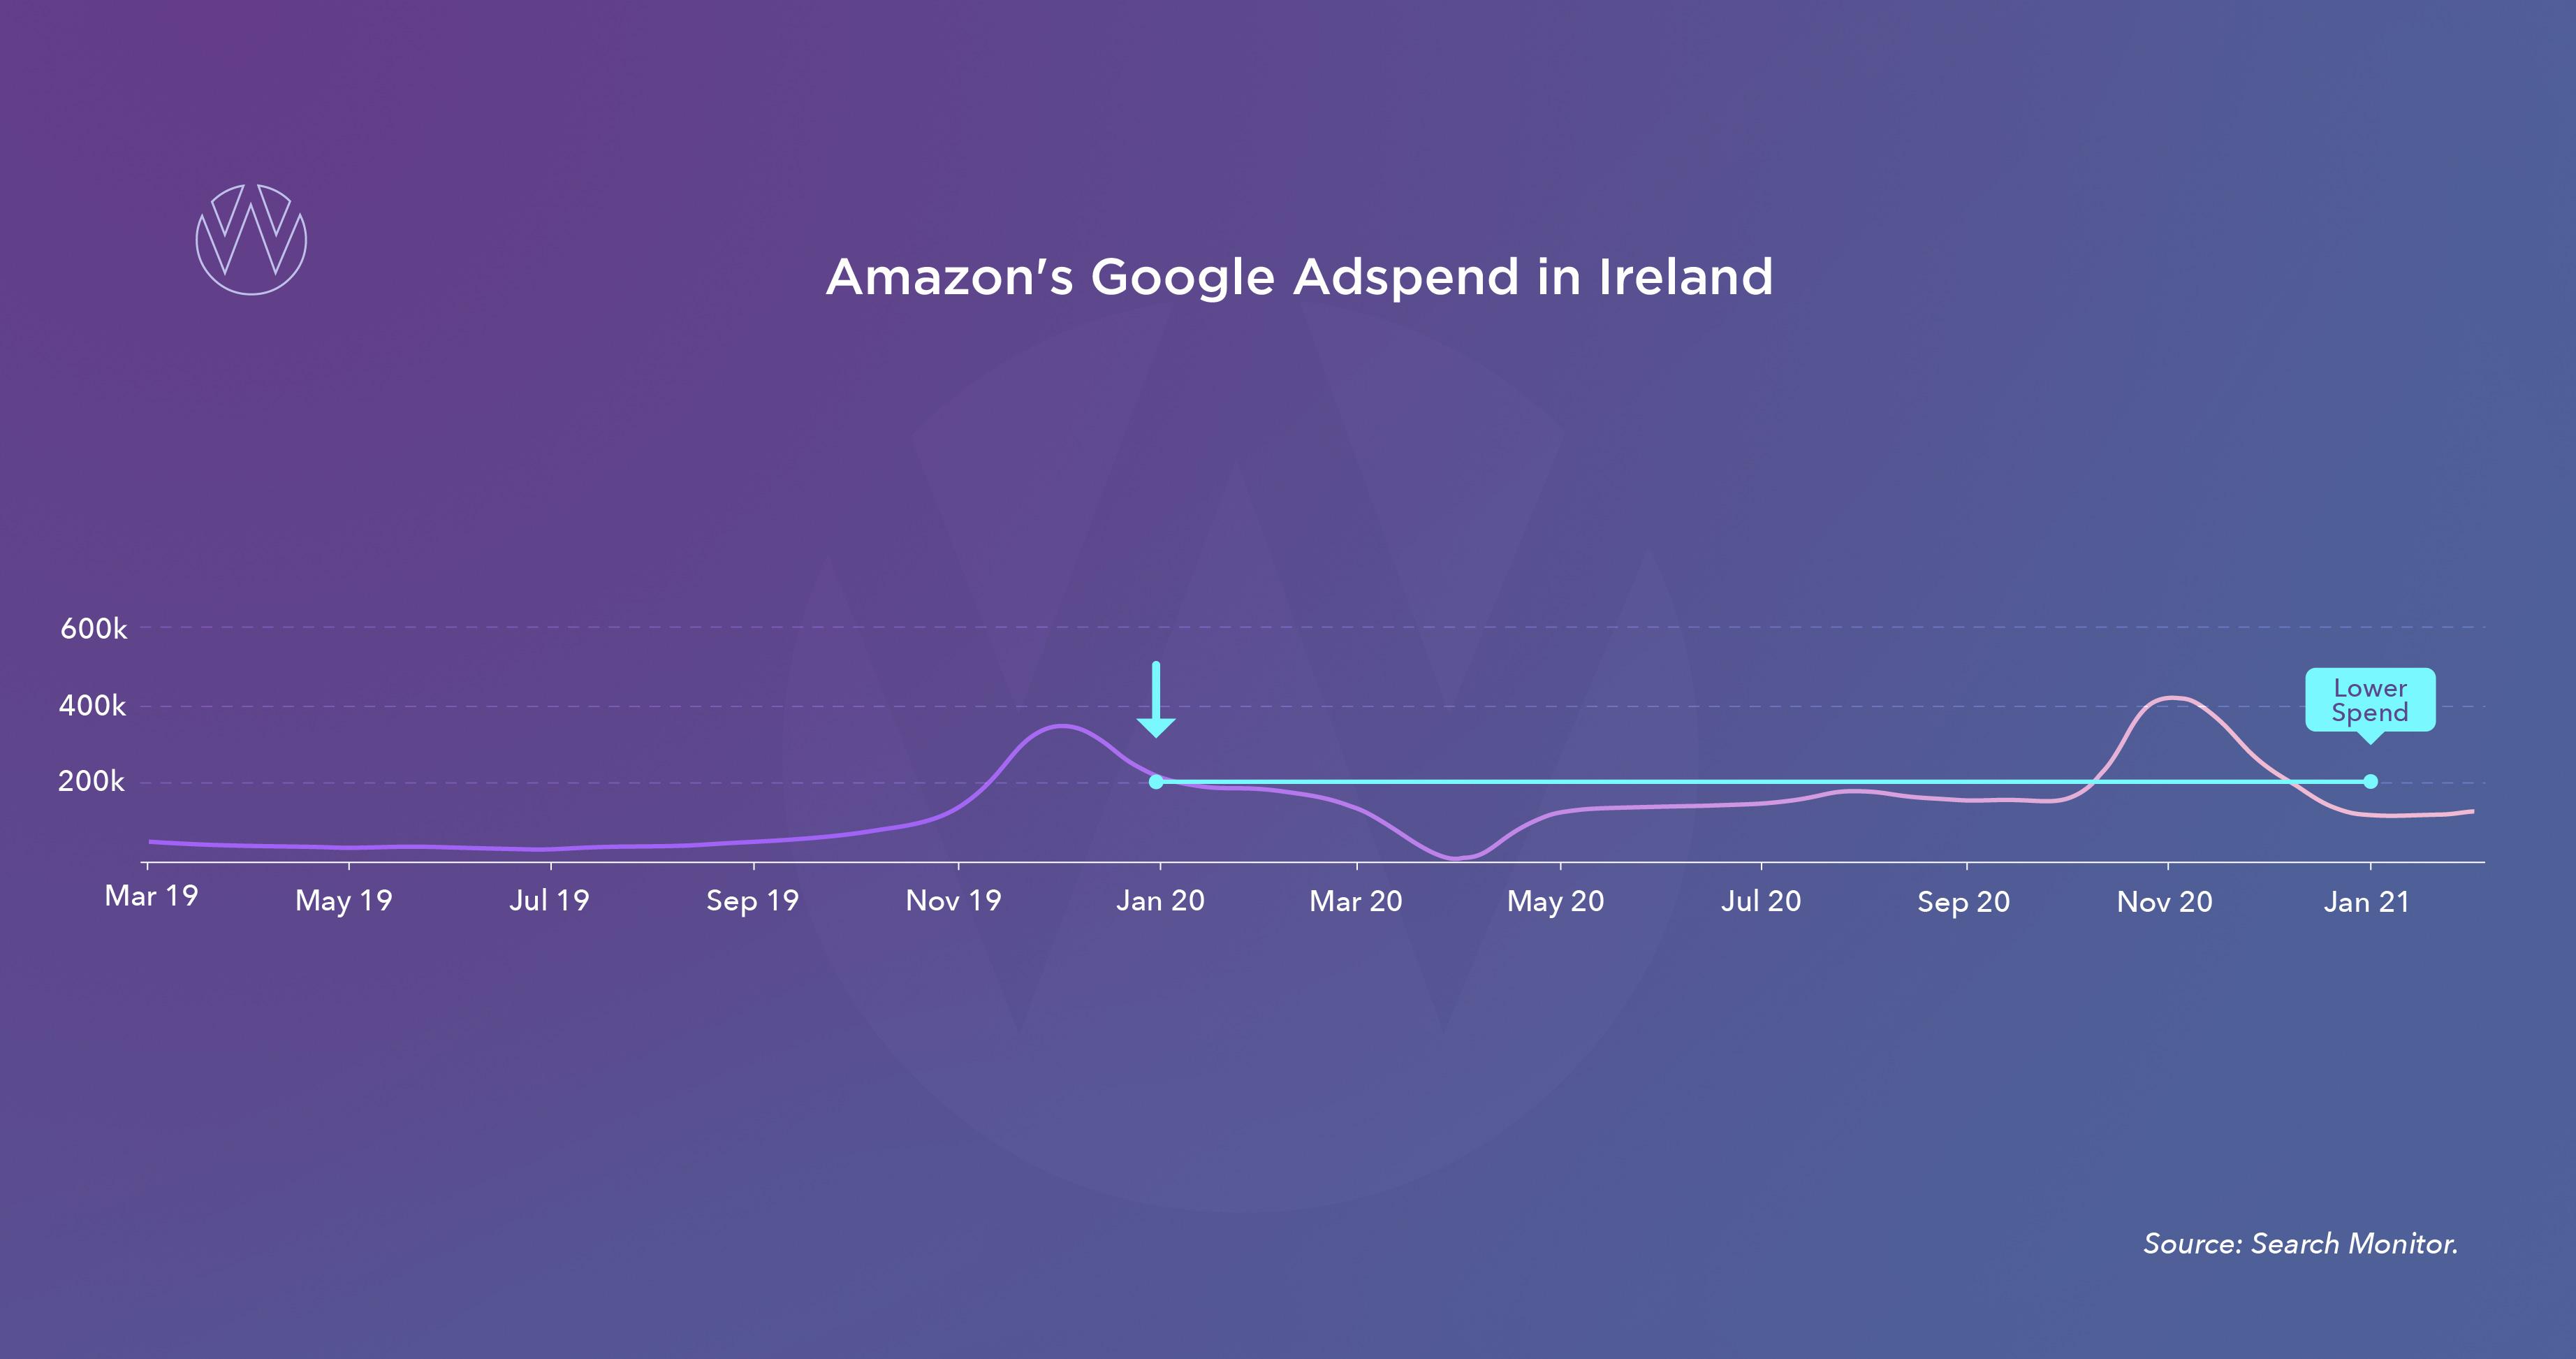 Amazon reduced spend in Ireland